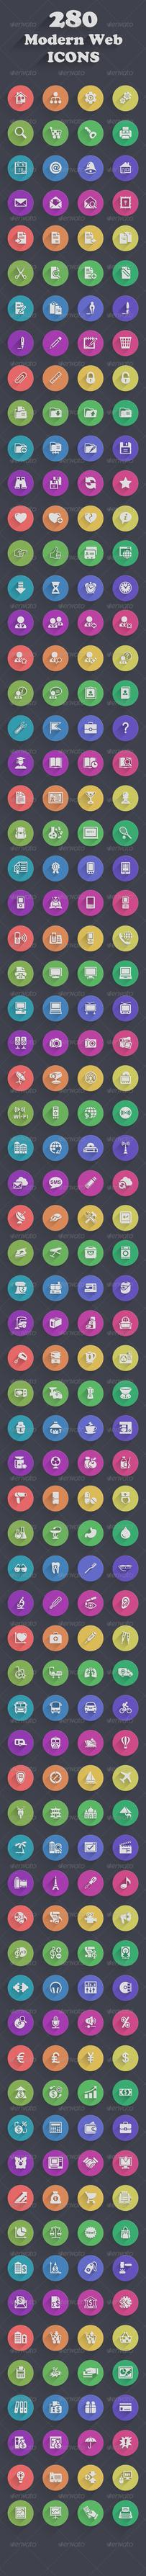 280 Modern Web Icons (7 Styles) by vuongthanhchung